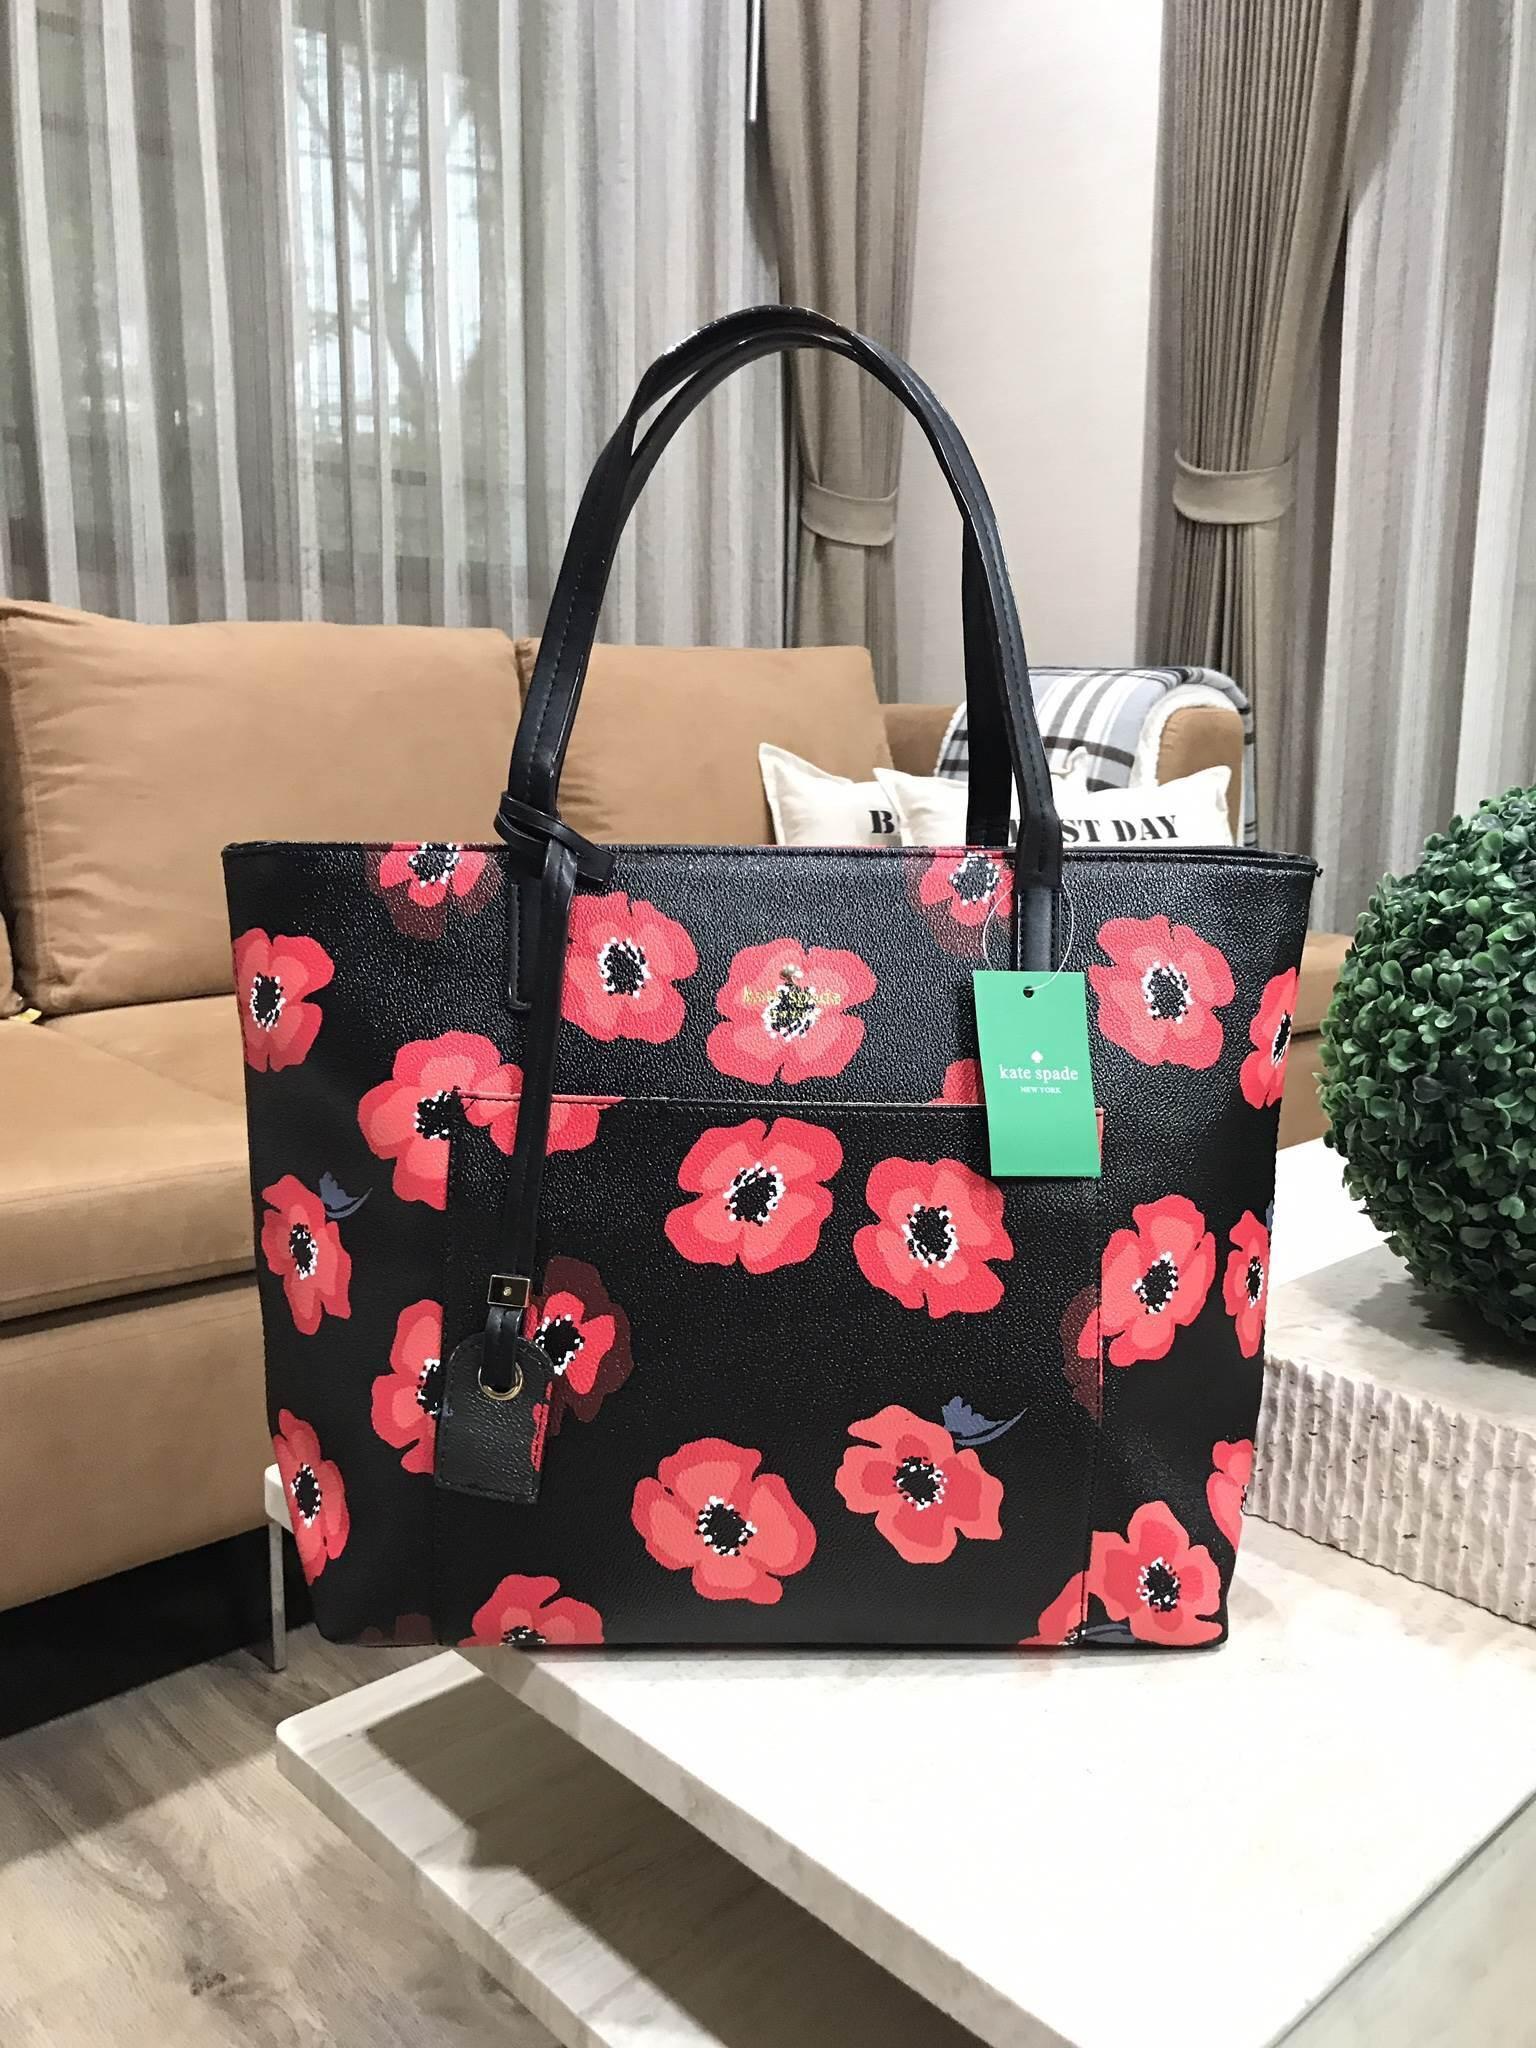 KATE SPADE New York Hyde Lane Poppies Riley Rose Tote Bag *ดำ